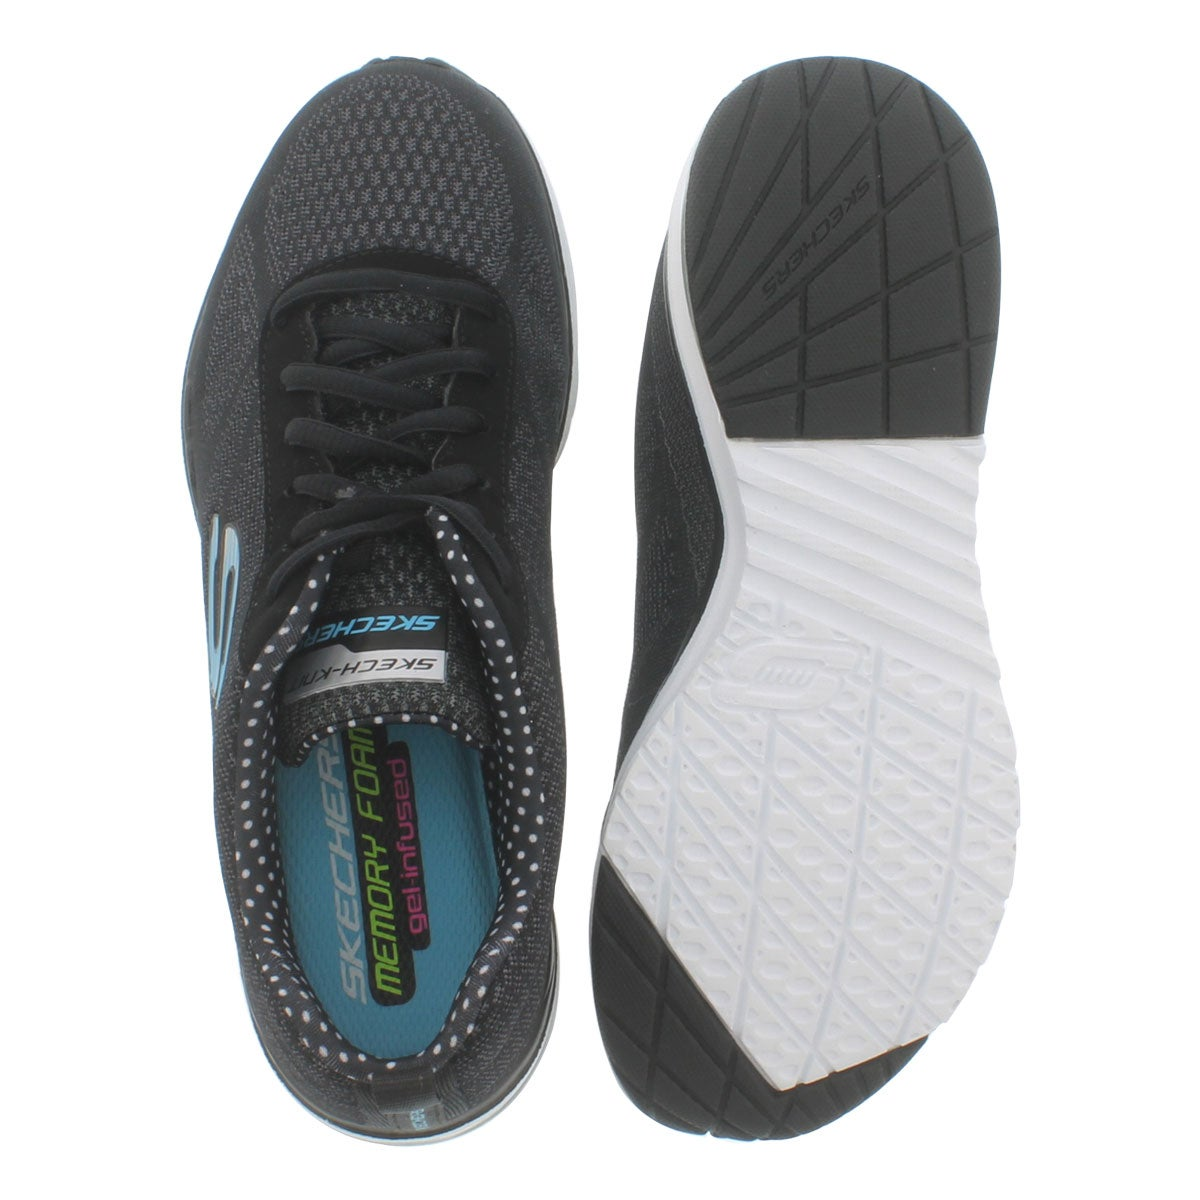 Lds Skech-Air Infinity blk/wht sneaker